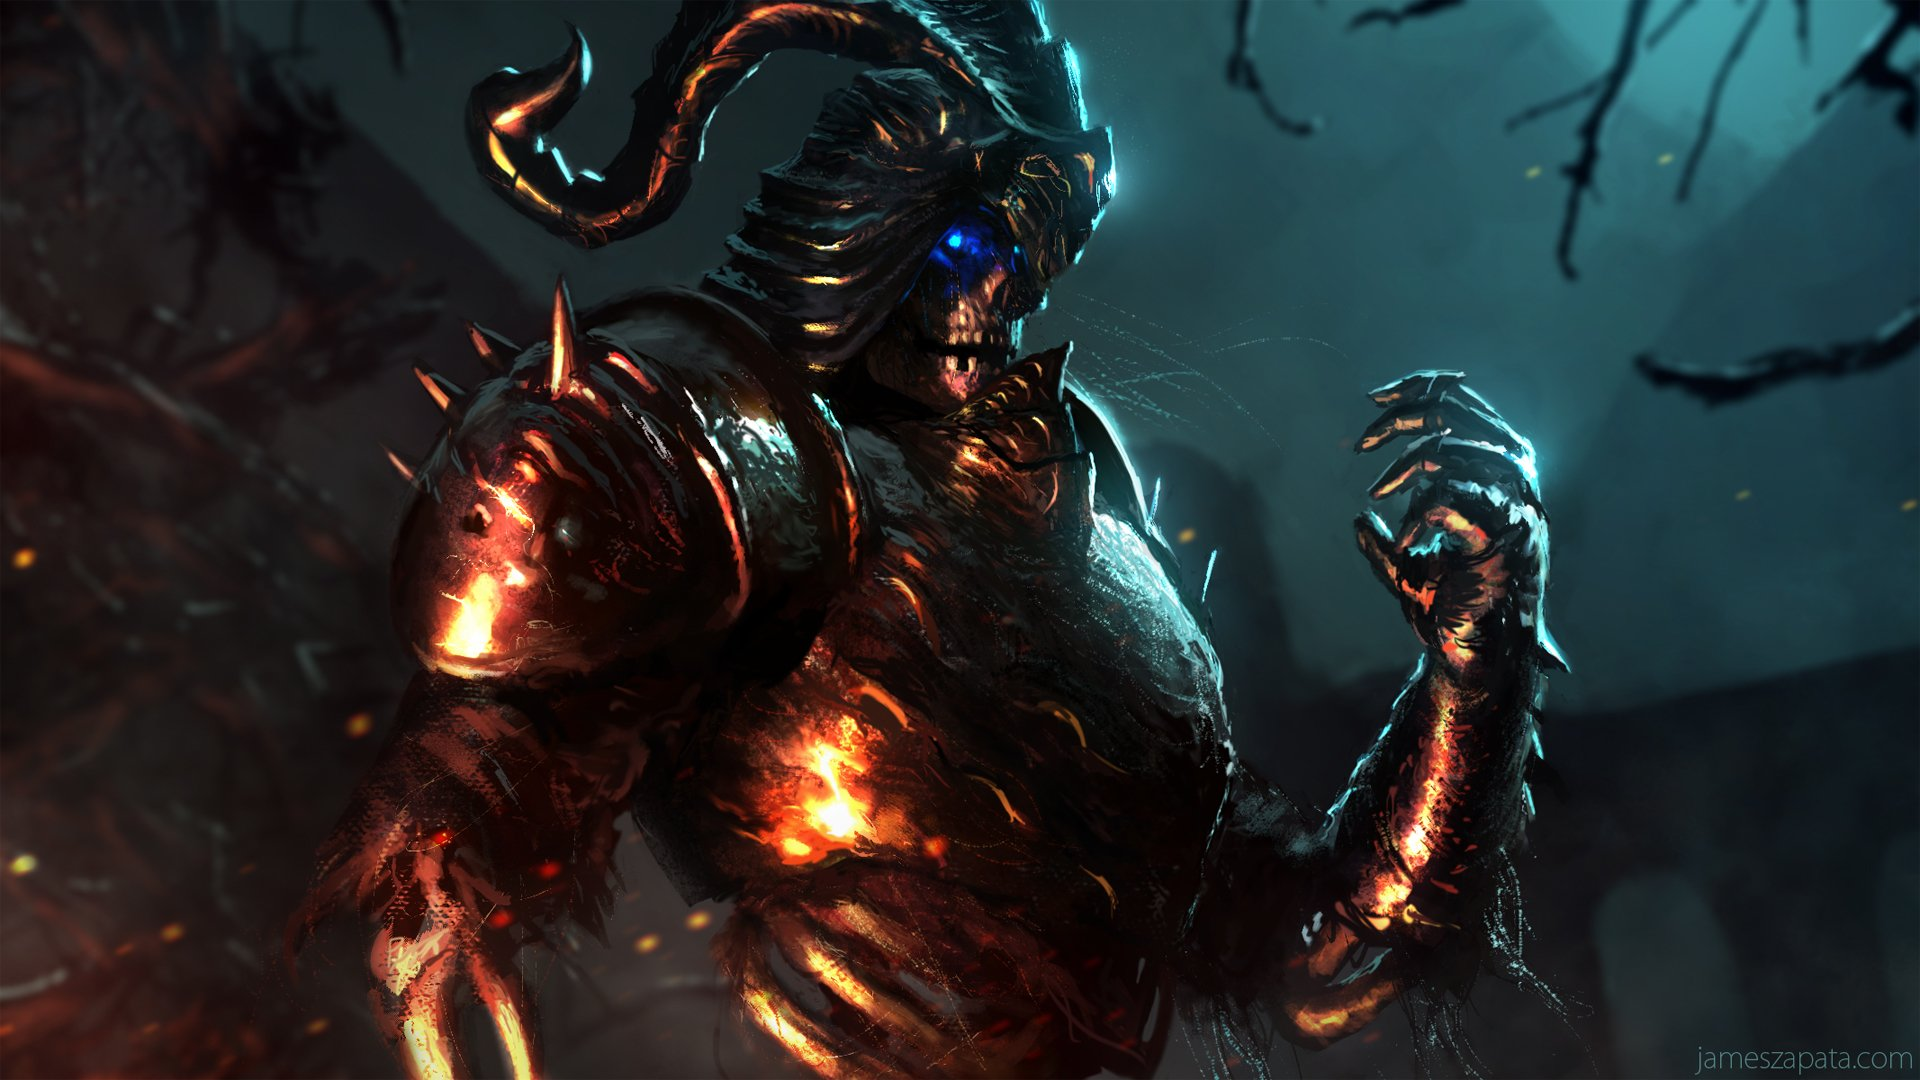 Dark Souls Ii Out Stunning Wallpapers High Quality: Dark Souls HD Wallpaper